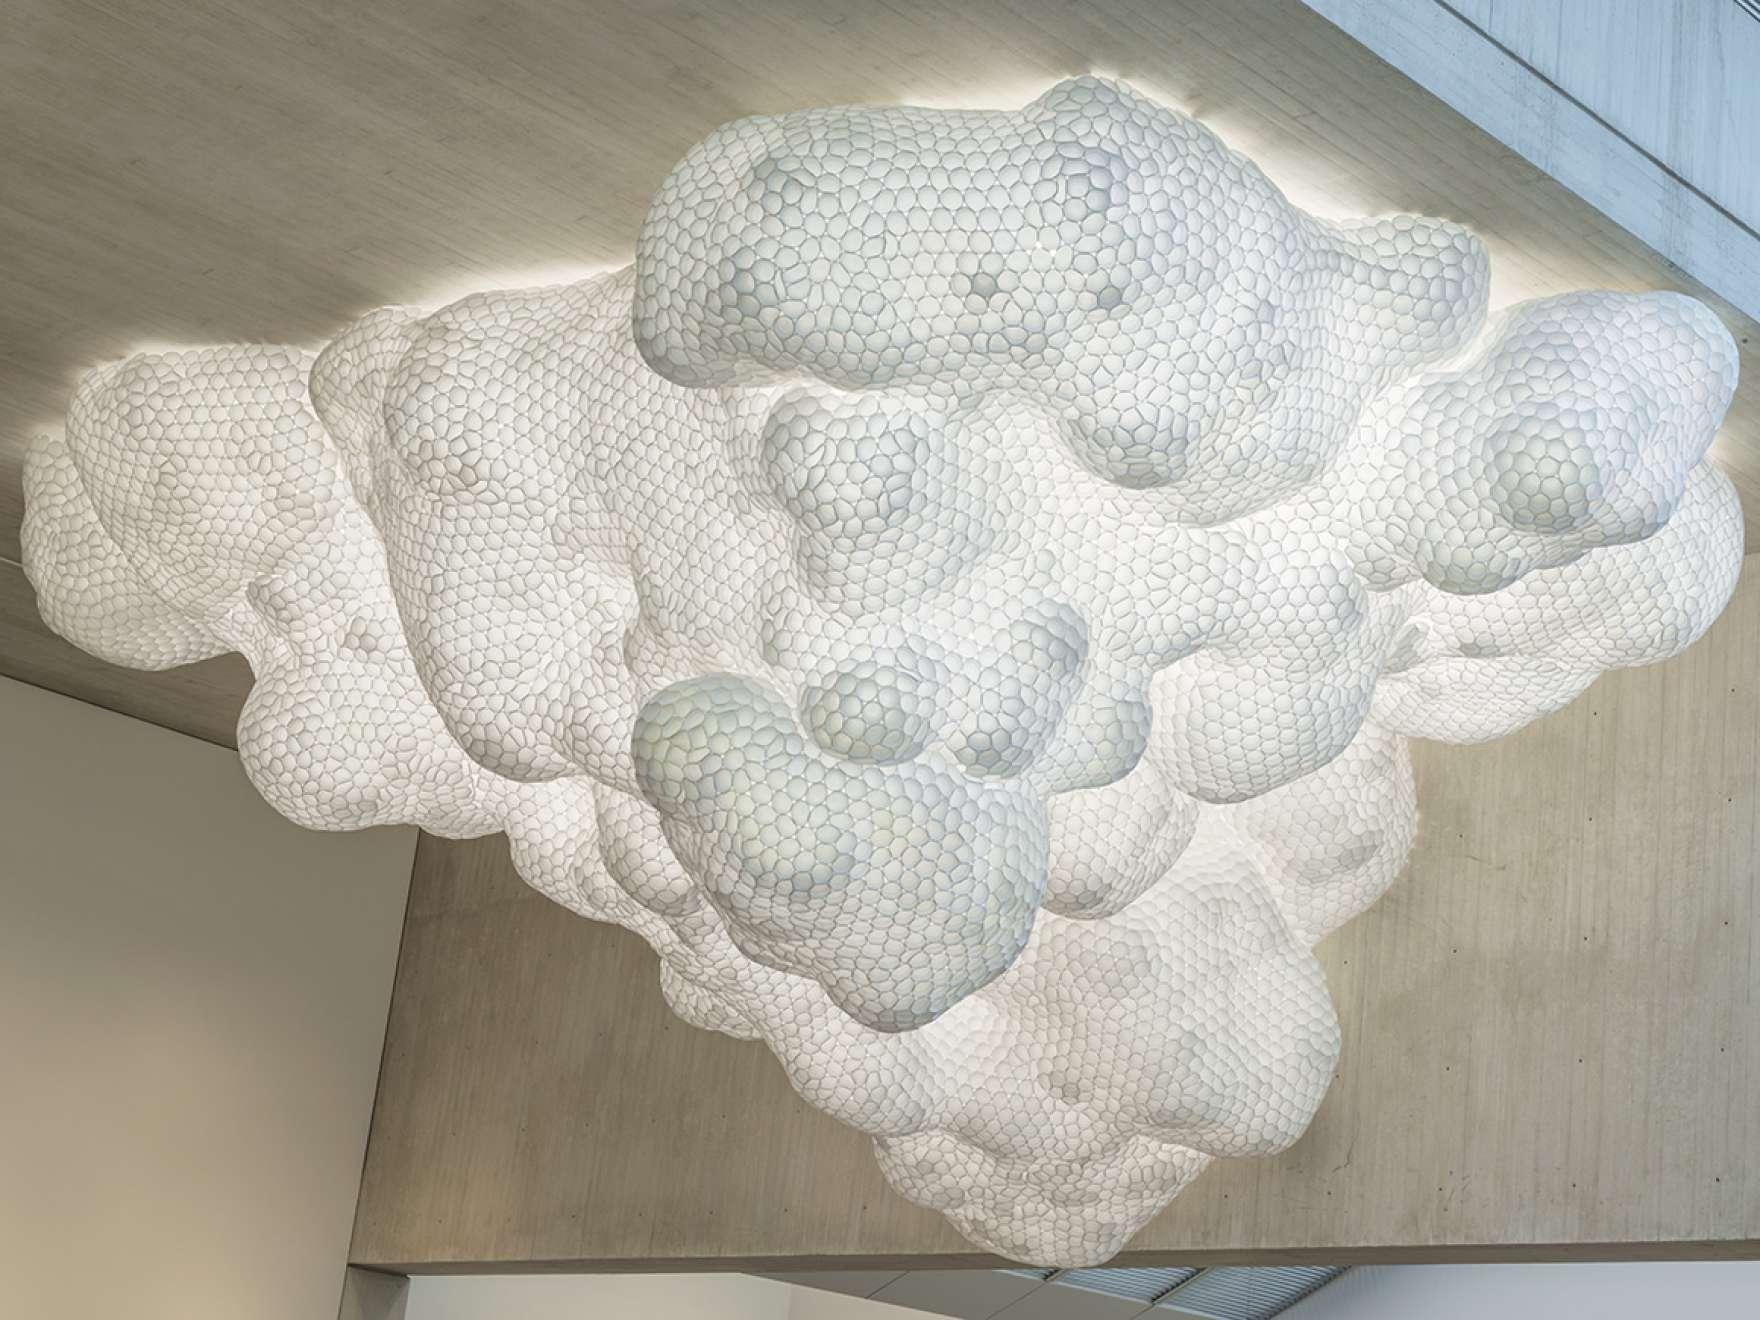 Tara Donovan's sculpture, in the shape of a cloud